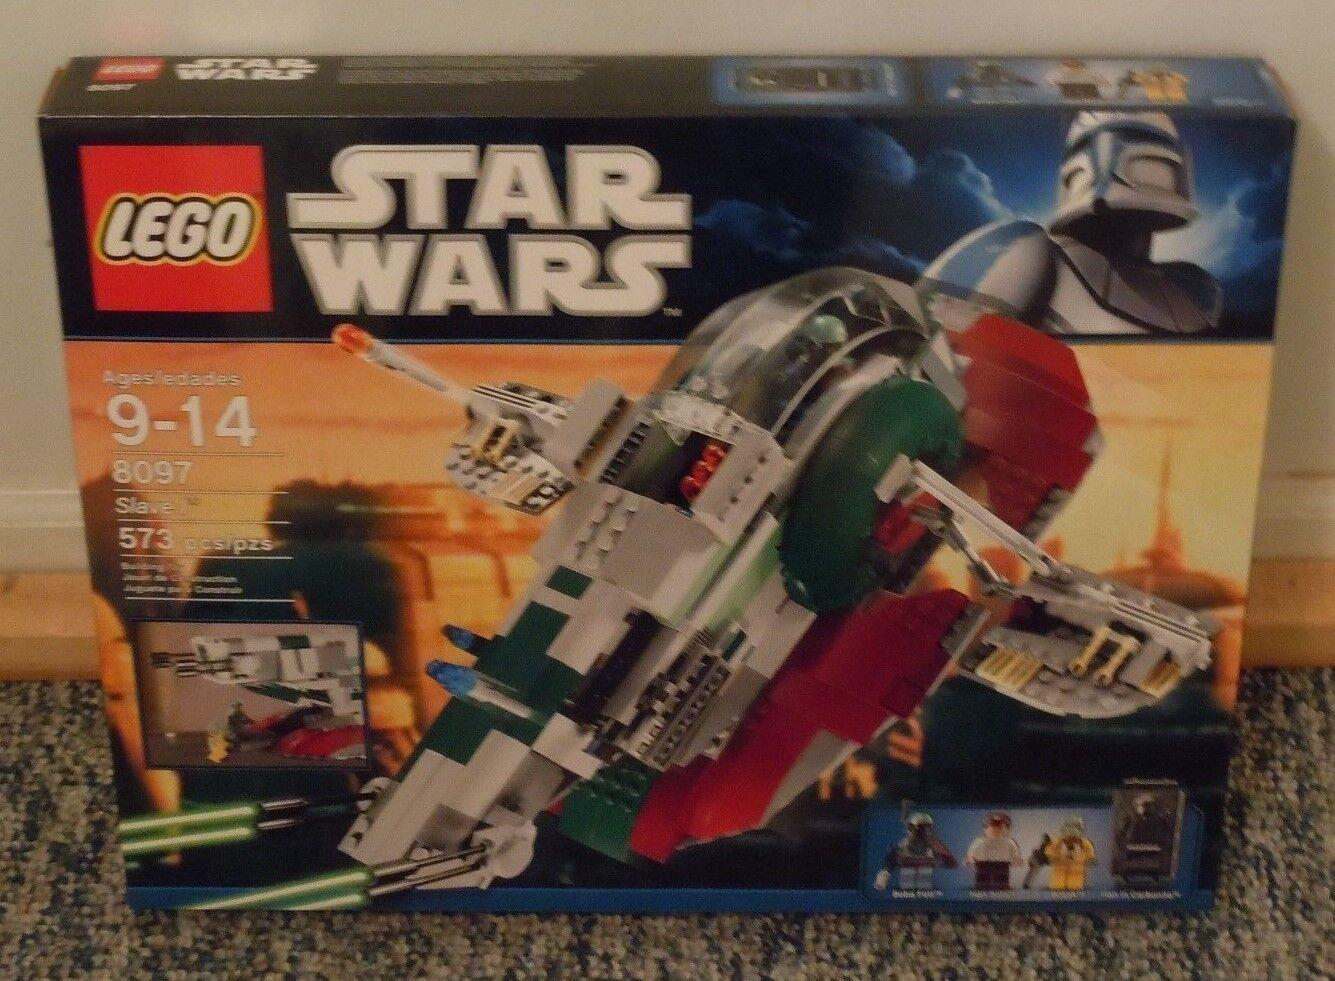 LEGO Star Wars Slave I Set 8097 Nuovo BOBA FETT BOSSK HAN SOLO Minifigs